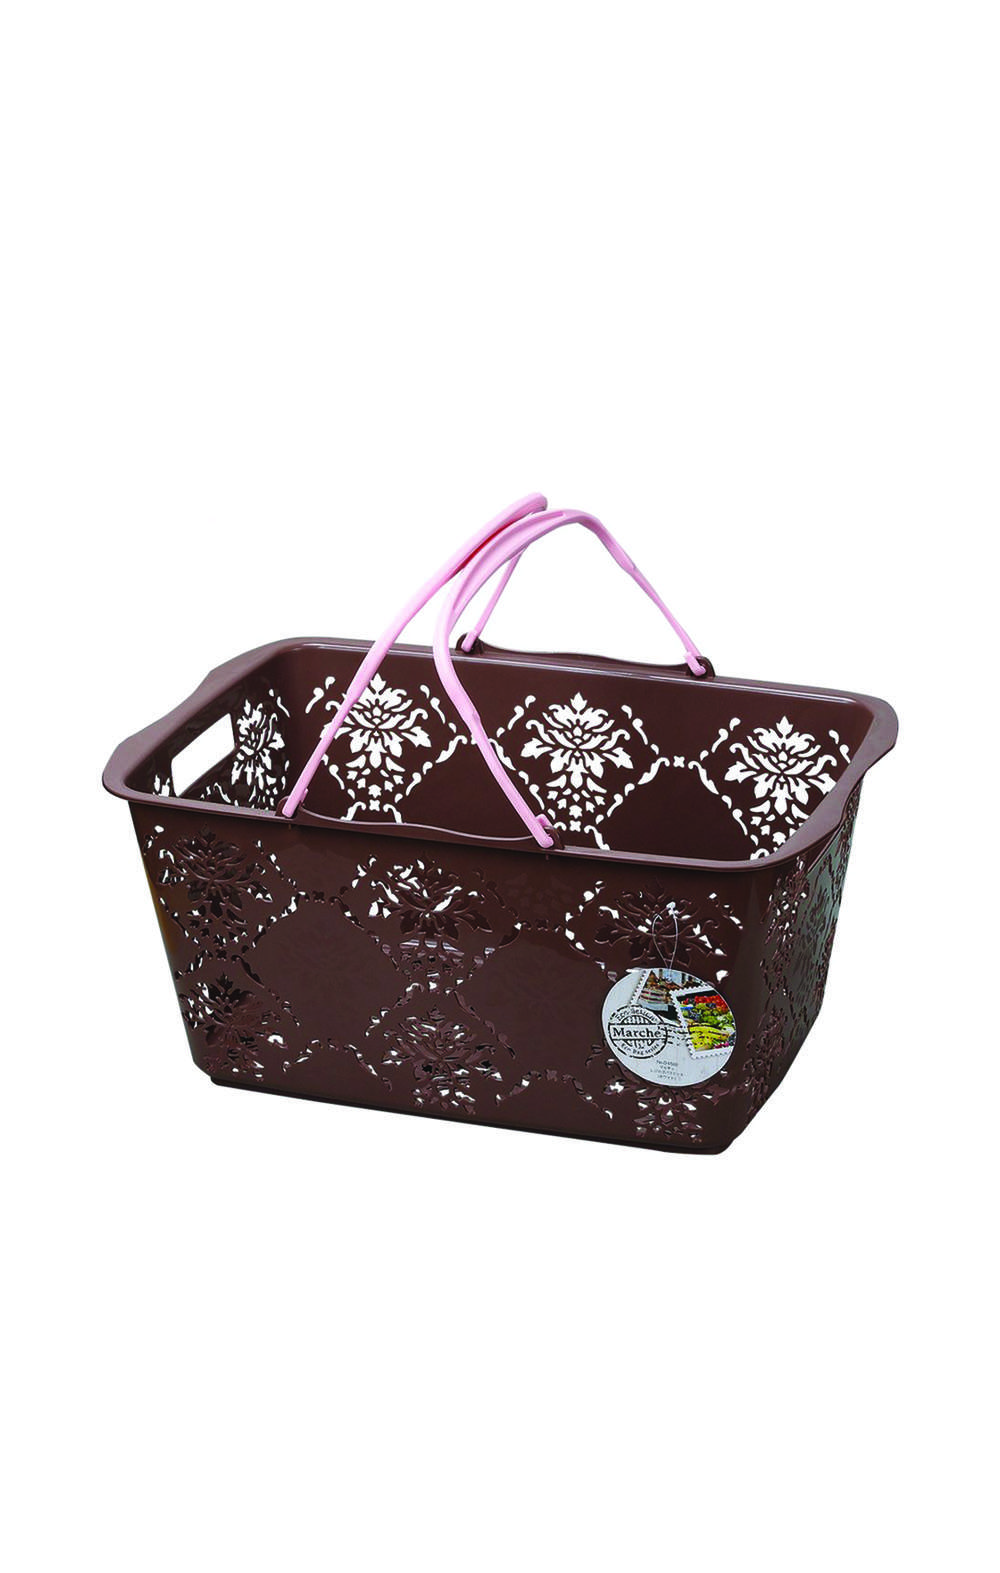 Pearl Metal  D-6500 Martine Cashier Basket سلة متعددة الأستخدام